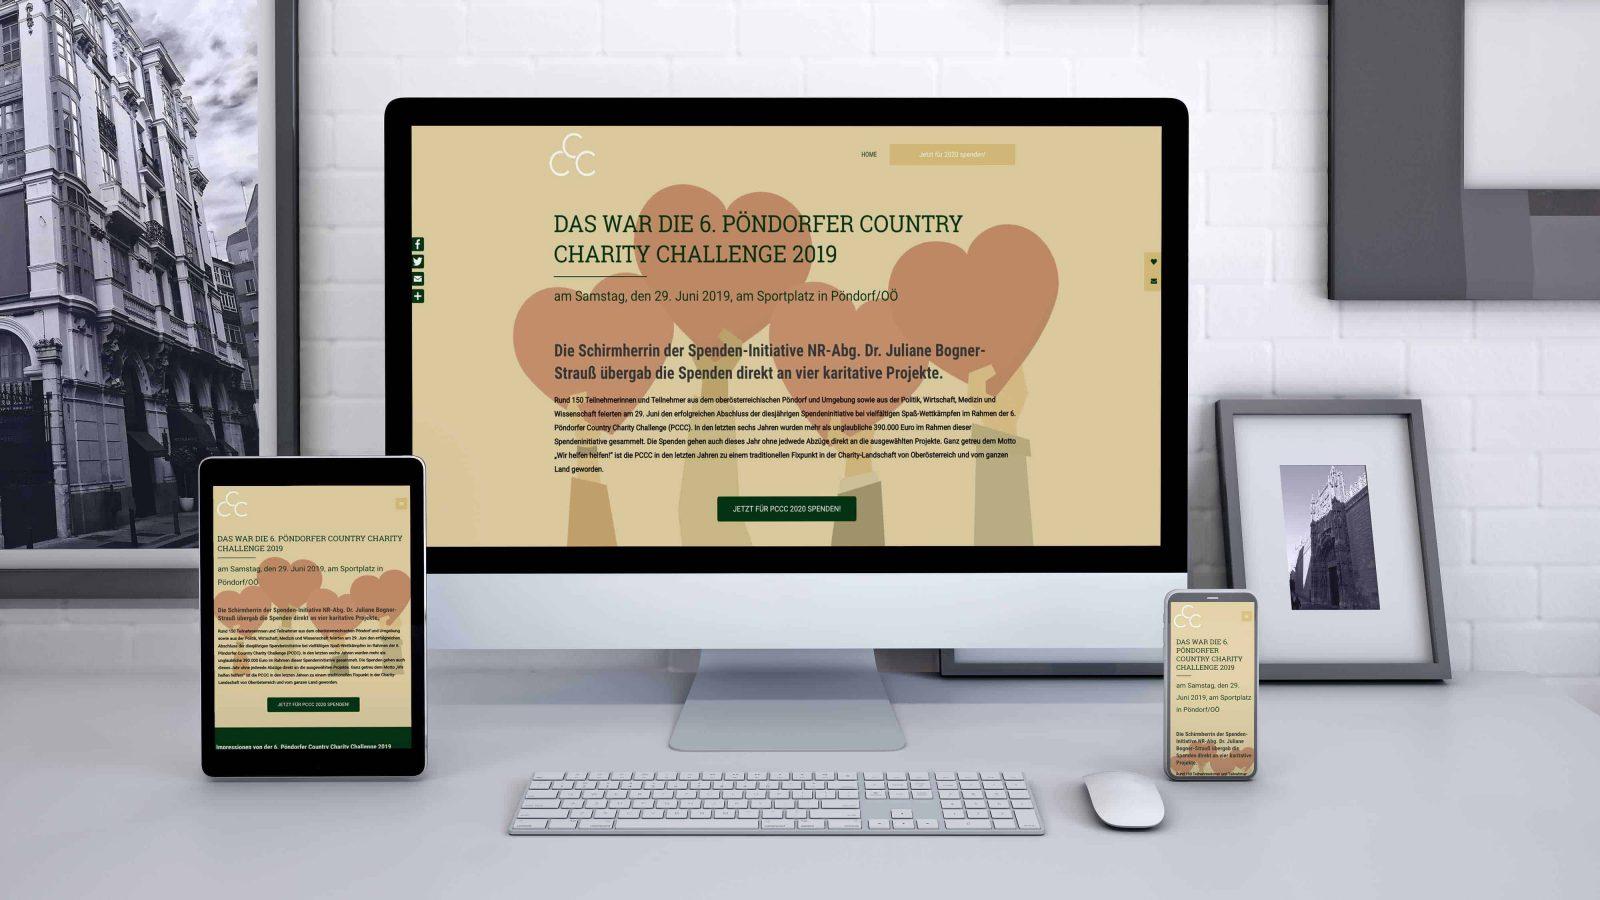 perionlineexperts-peri-onlineexperts-agentur-onlineagentur-internetpraesenz-social-media-socialmedia-mockup-poendorfer-country-charity-challenge-pccc-website